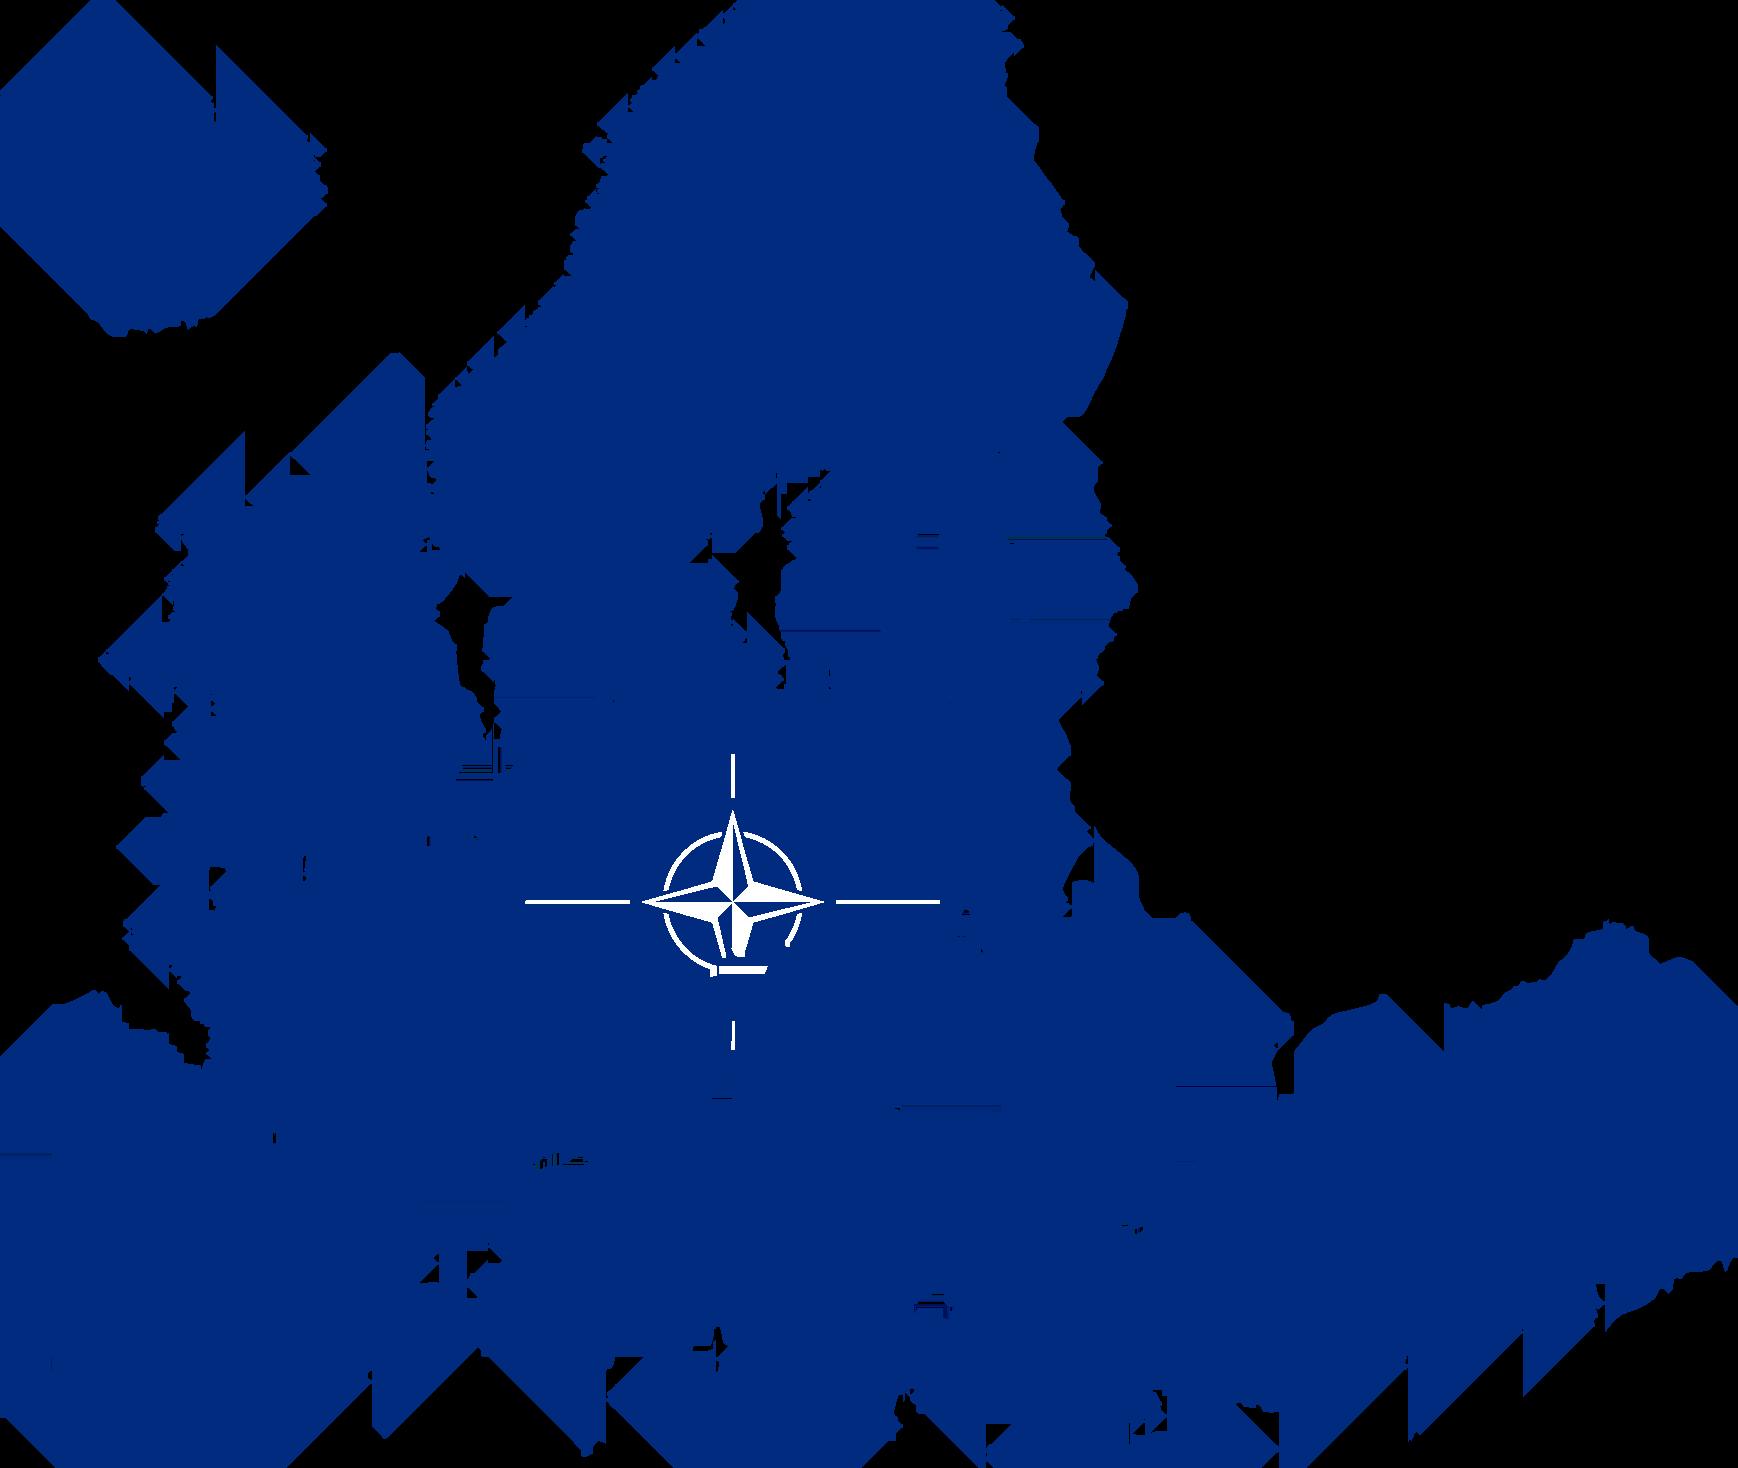 Fileflag map of nato countries europeg wikimedia commons fileflag map of nato countries europeg gumiabroncs Image collections